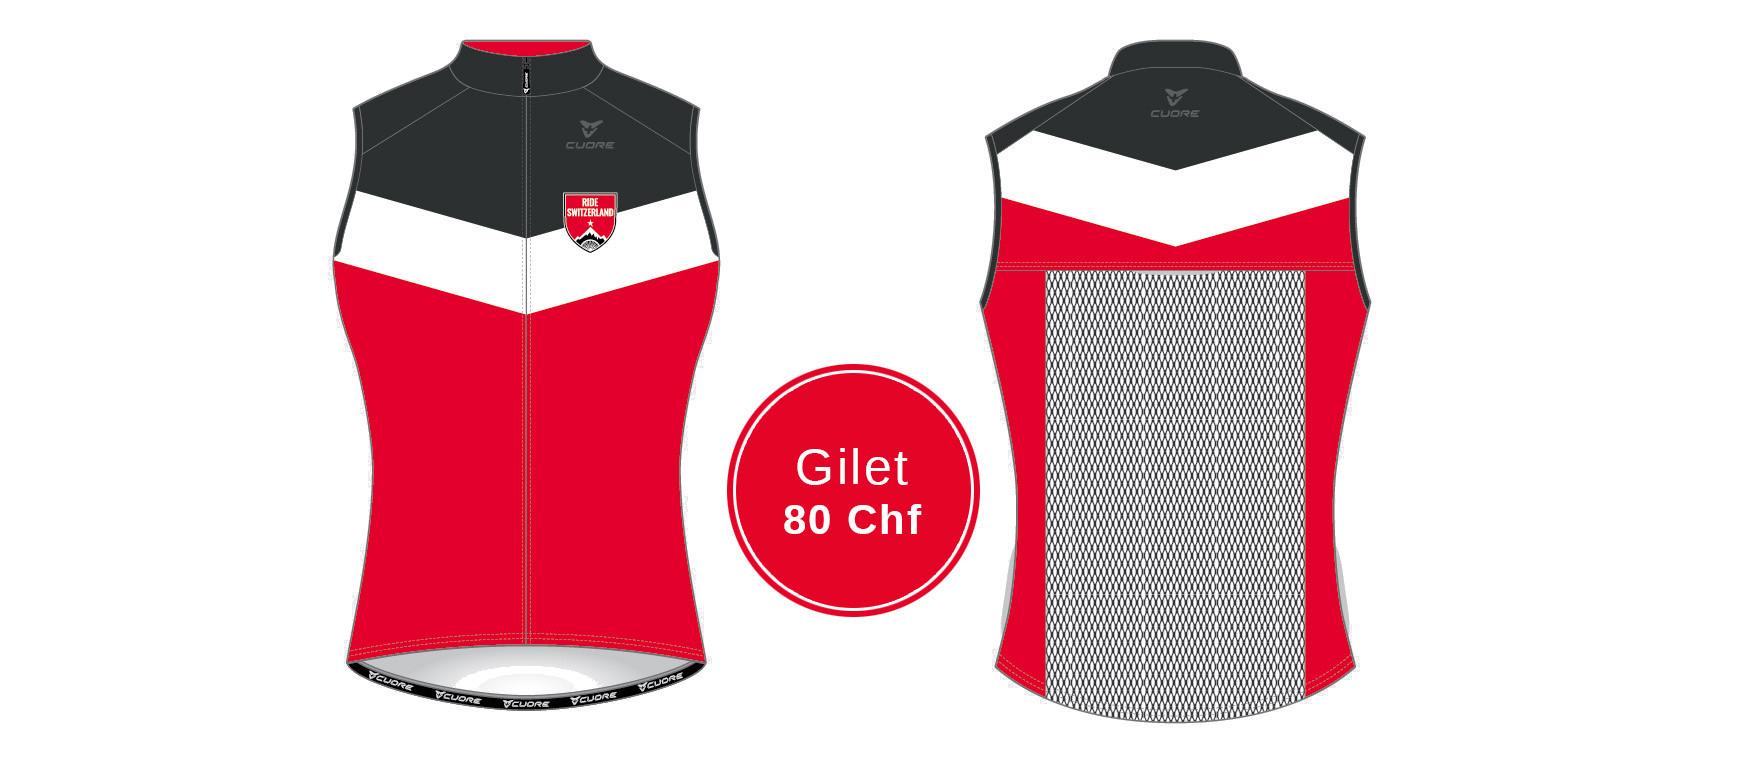 Gilet_Rideswitzerland_19.jpg